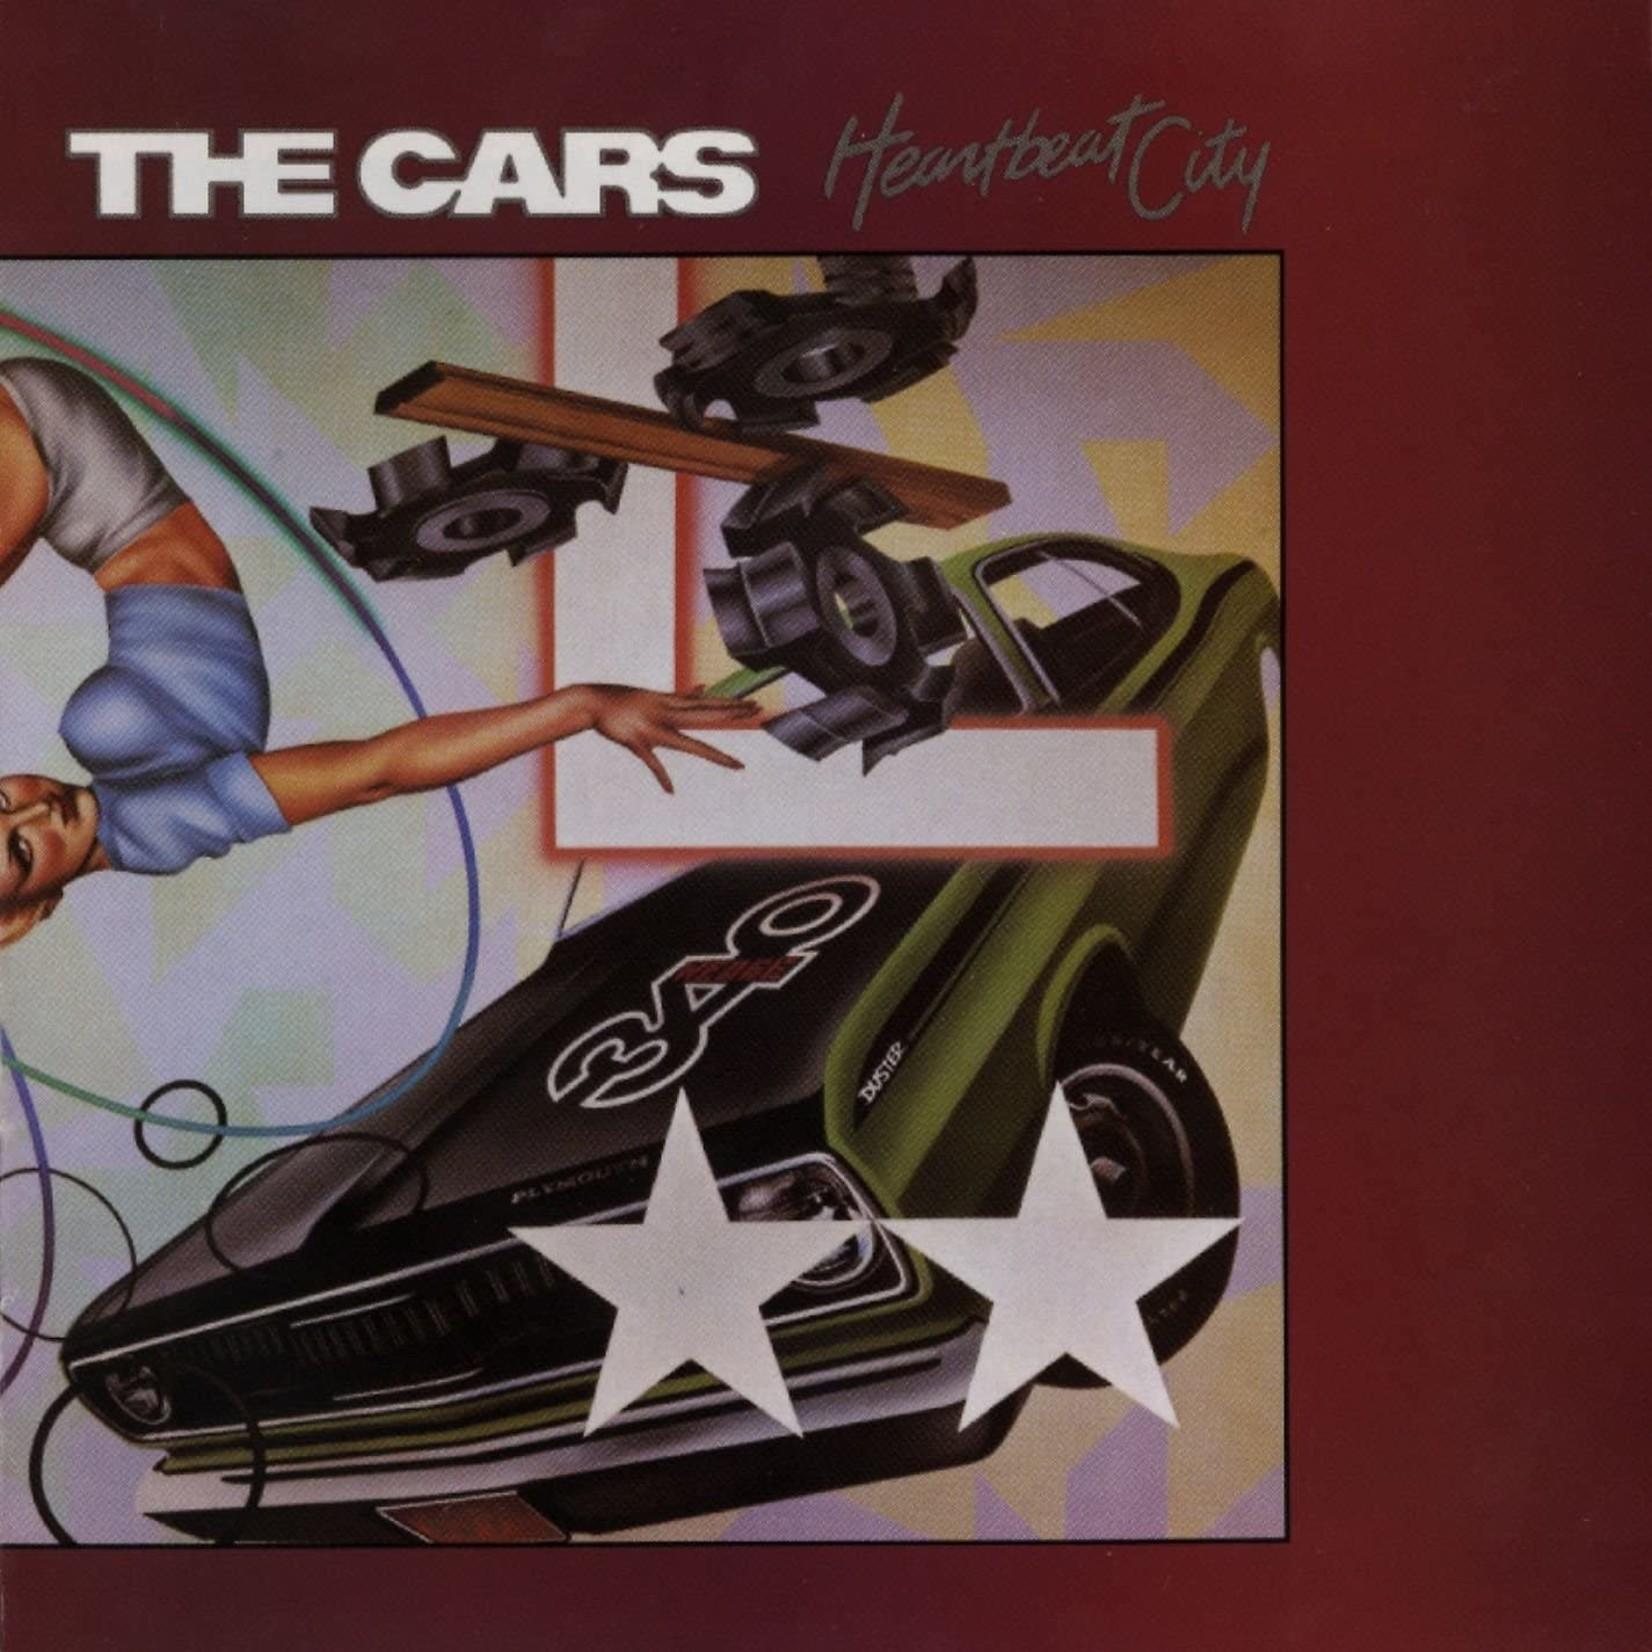 [Vintage] Cars: Heartbeat City